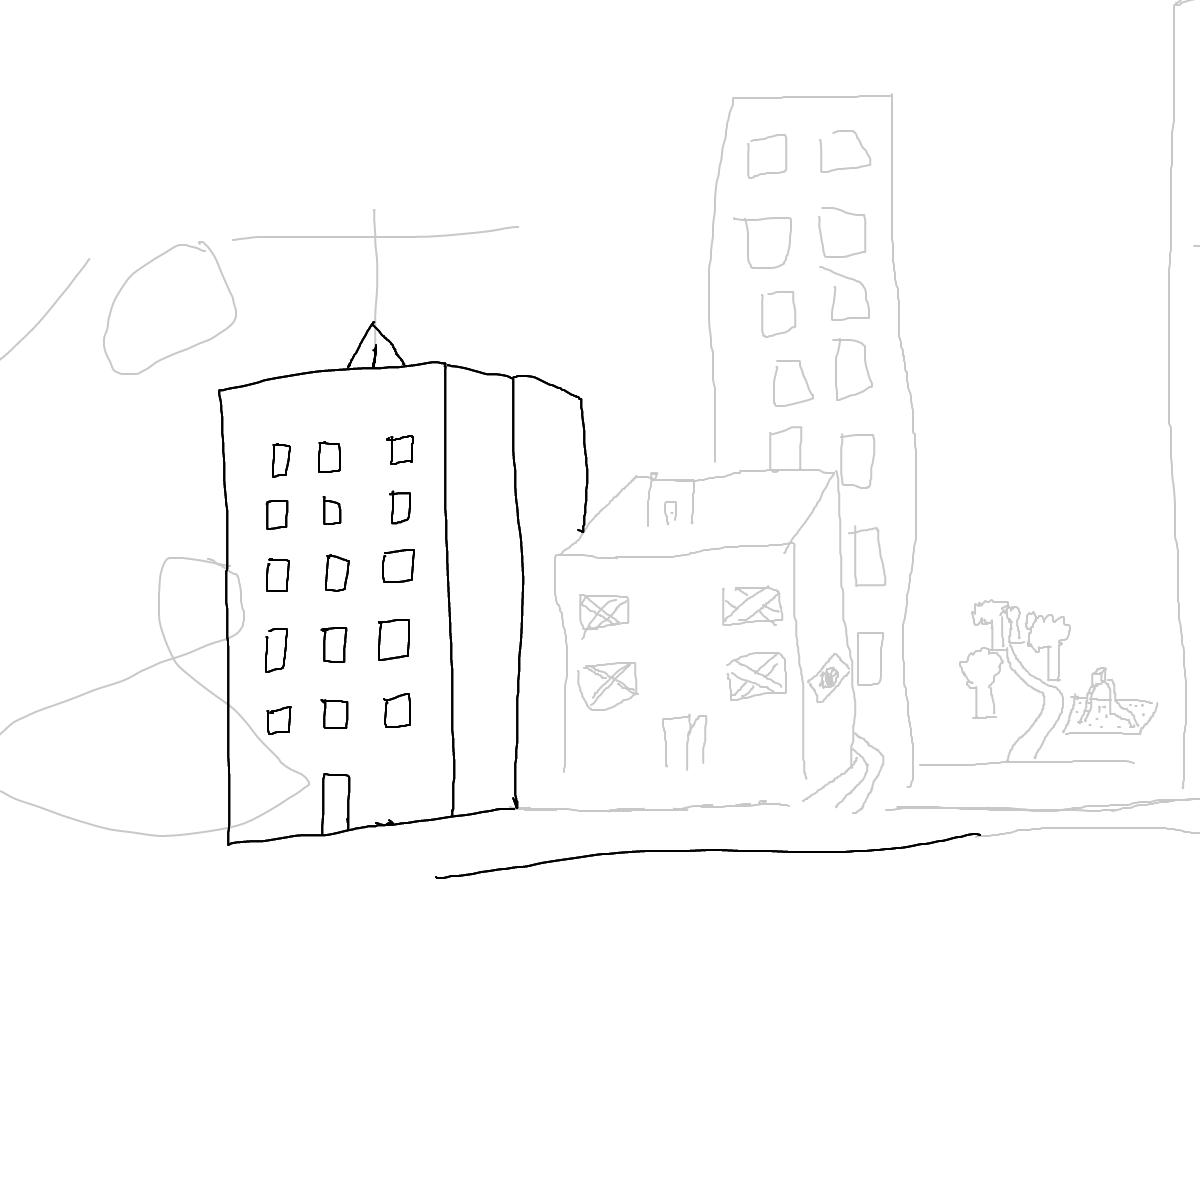 BAAAM drawing#16124 lat:52.4750022888183600lng: 13.4074335098266600